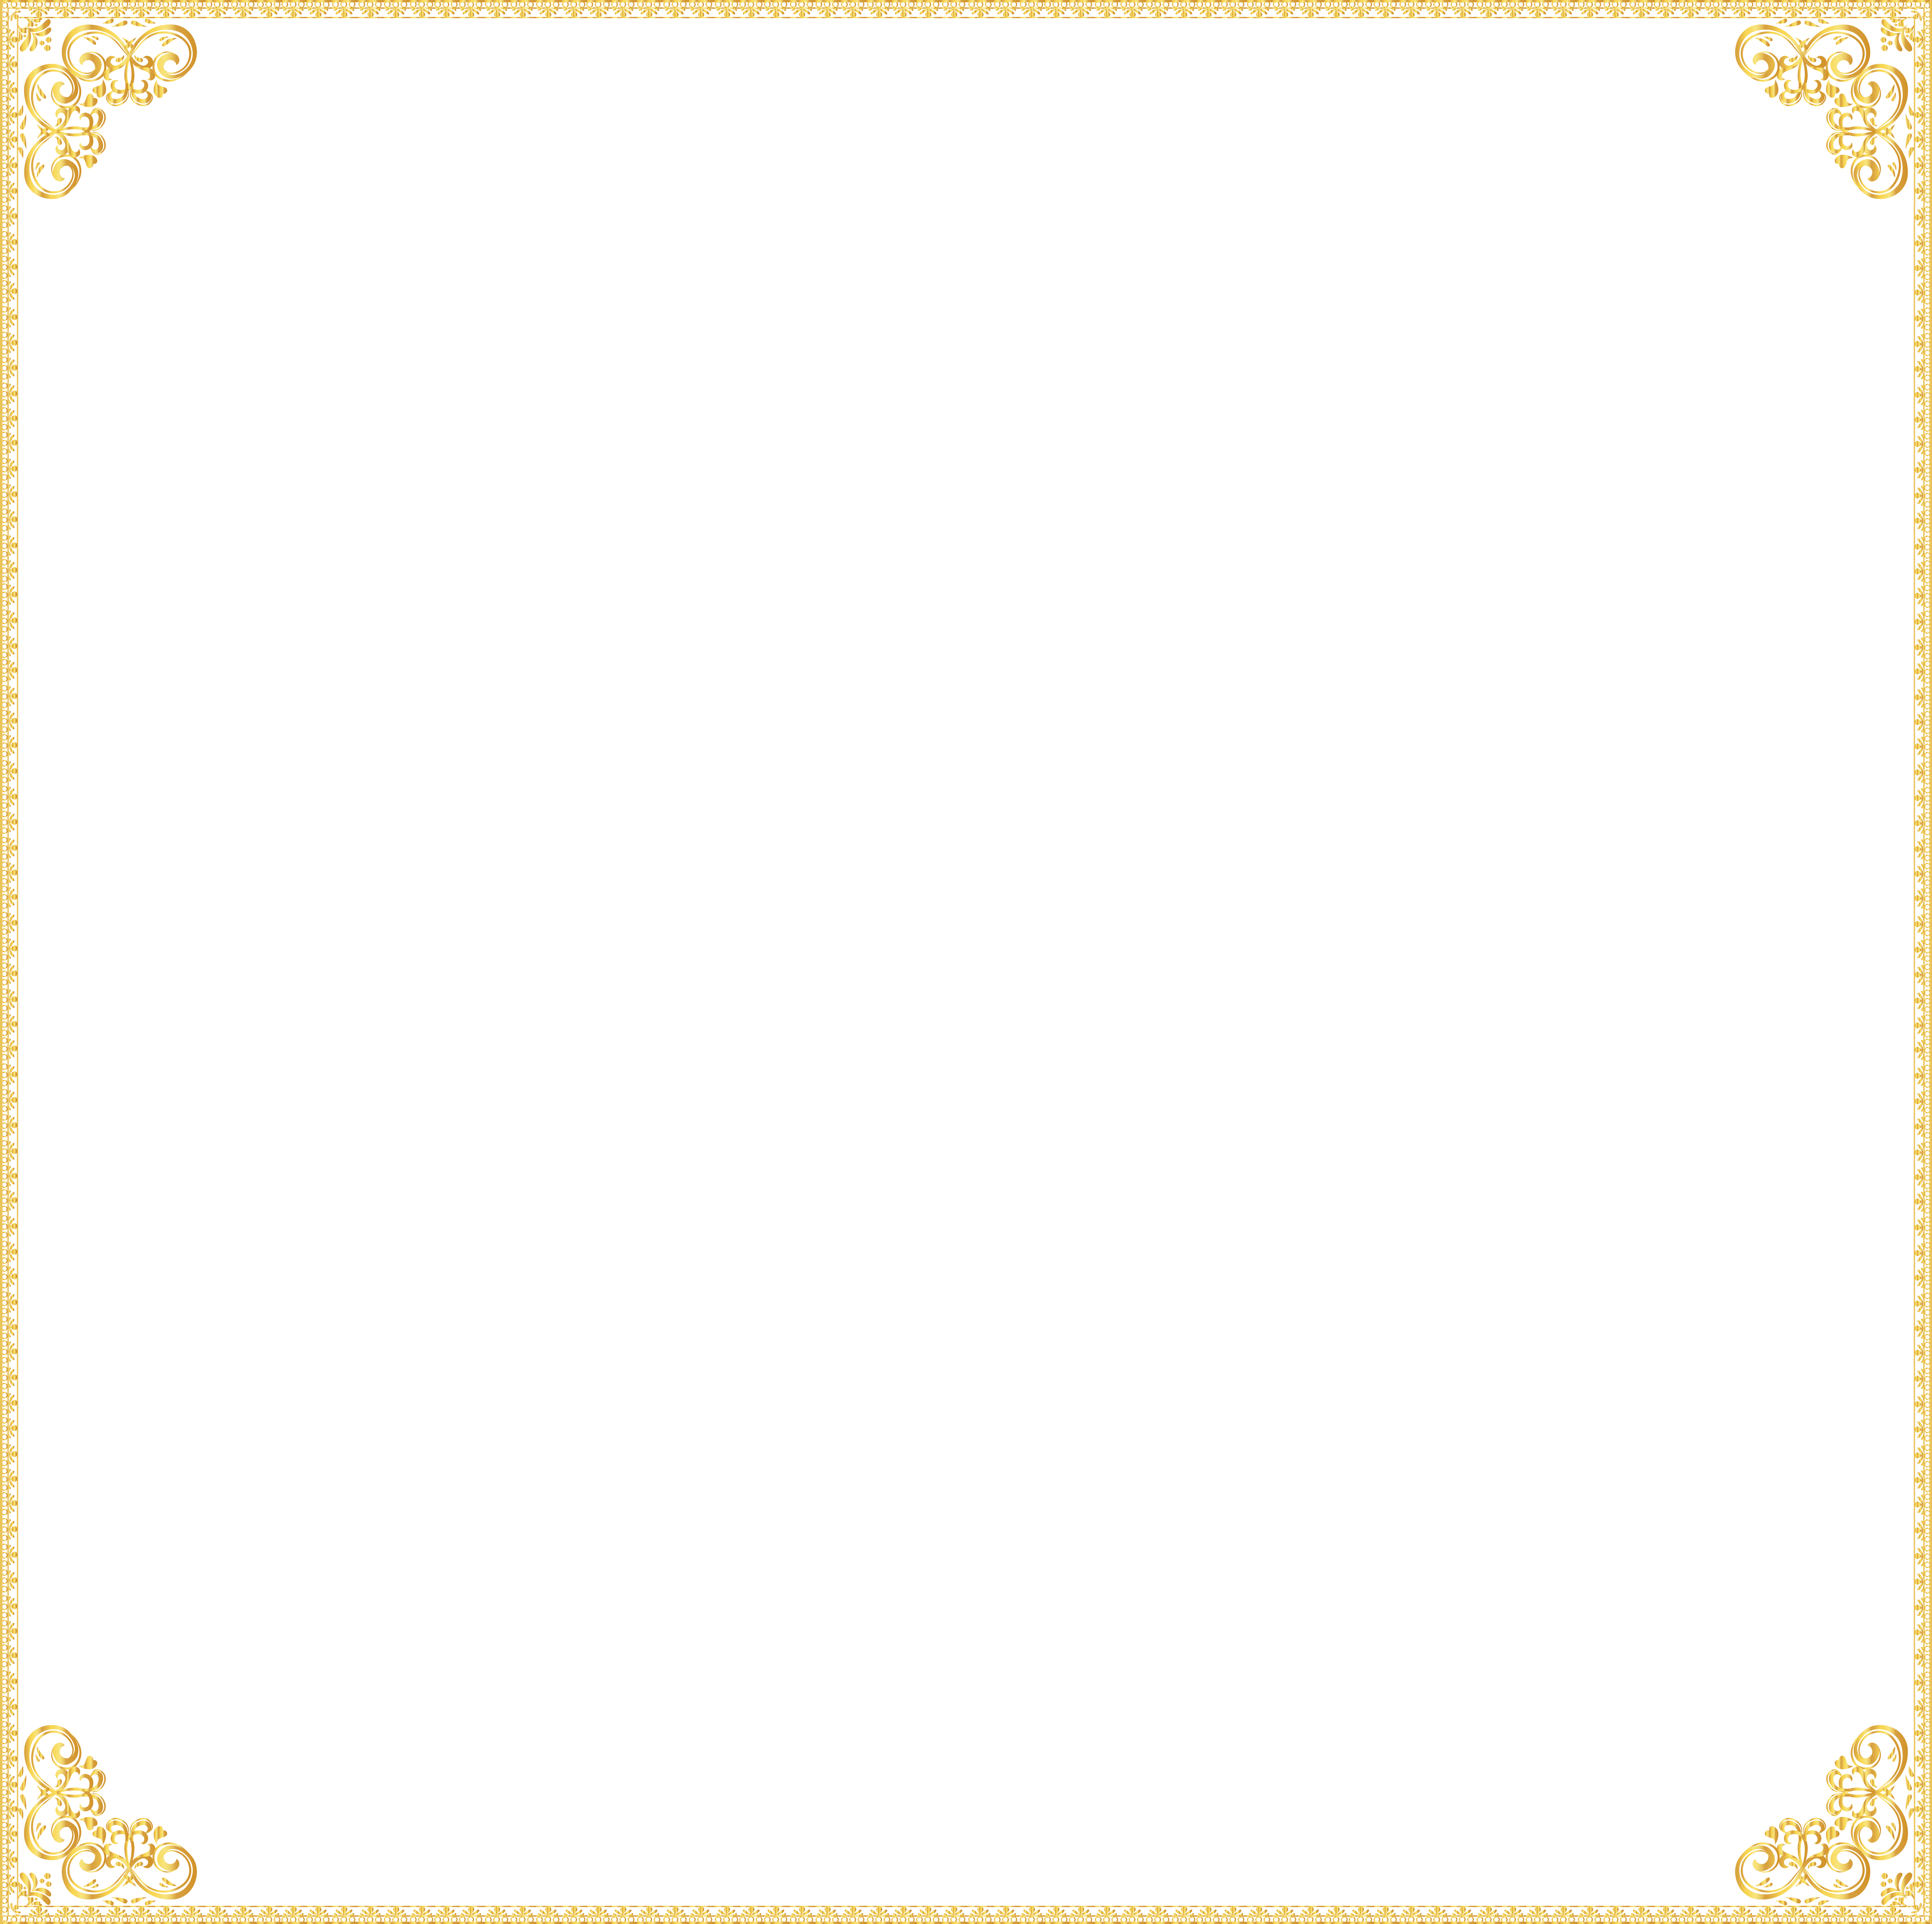 image transparent library Workout clipart border. Golden frame transparent clip